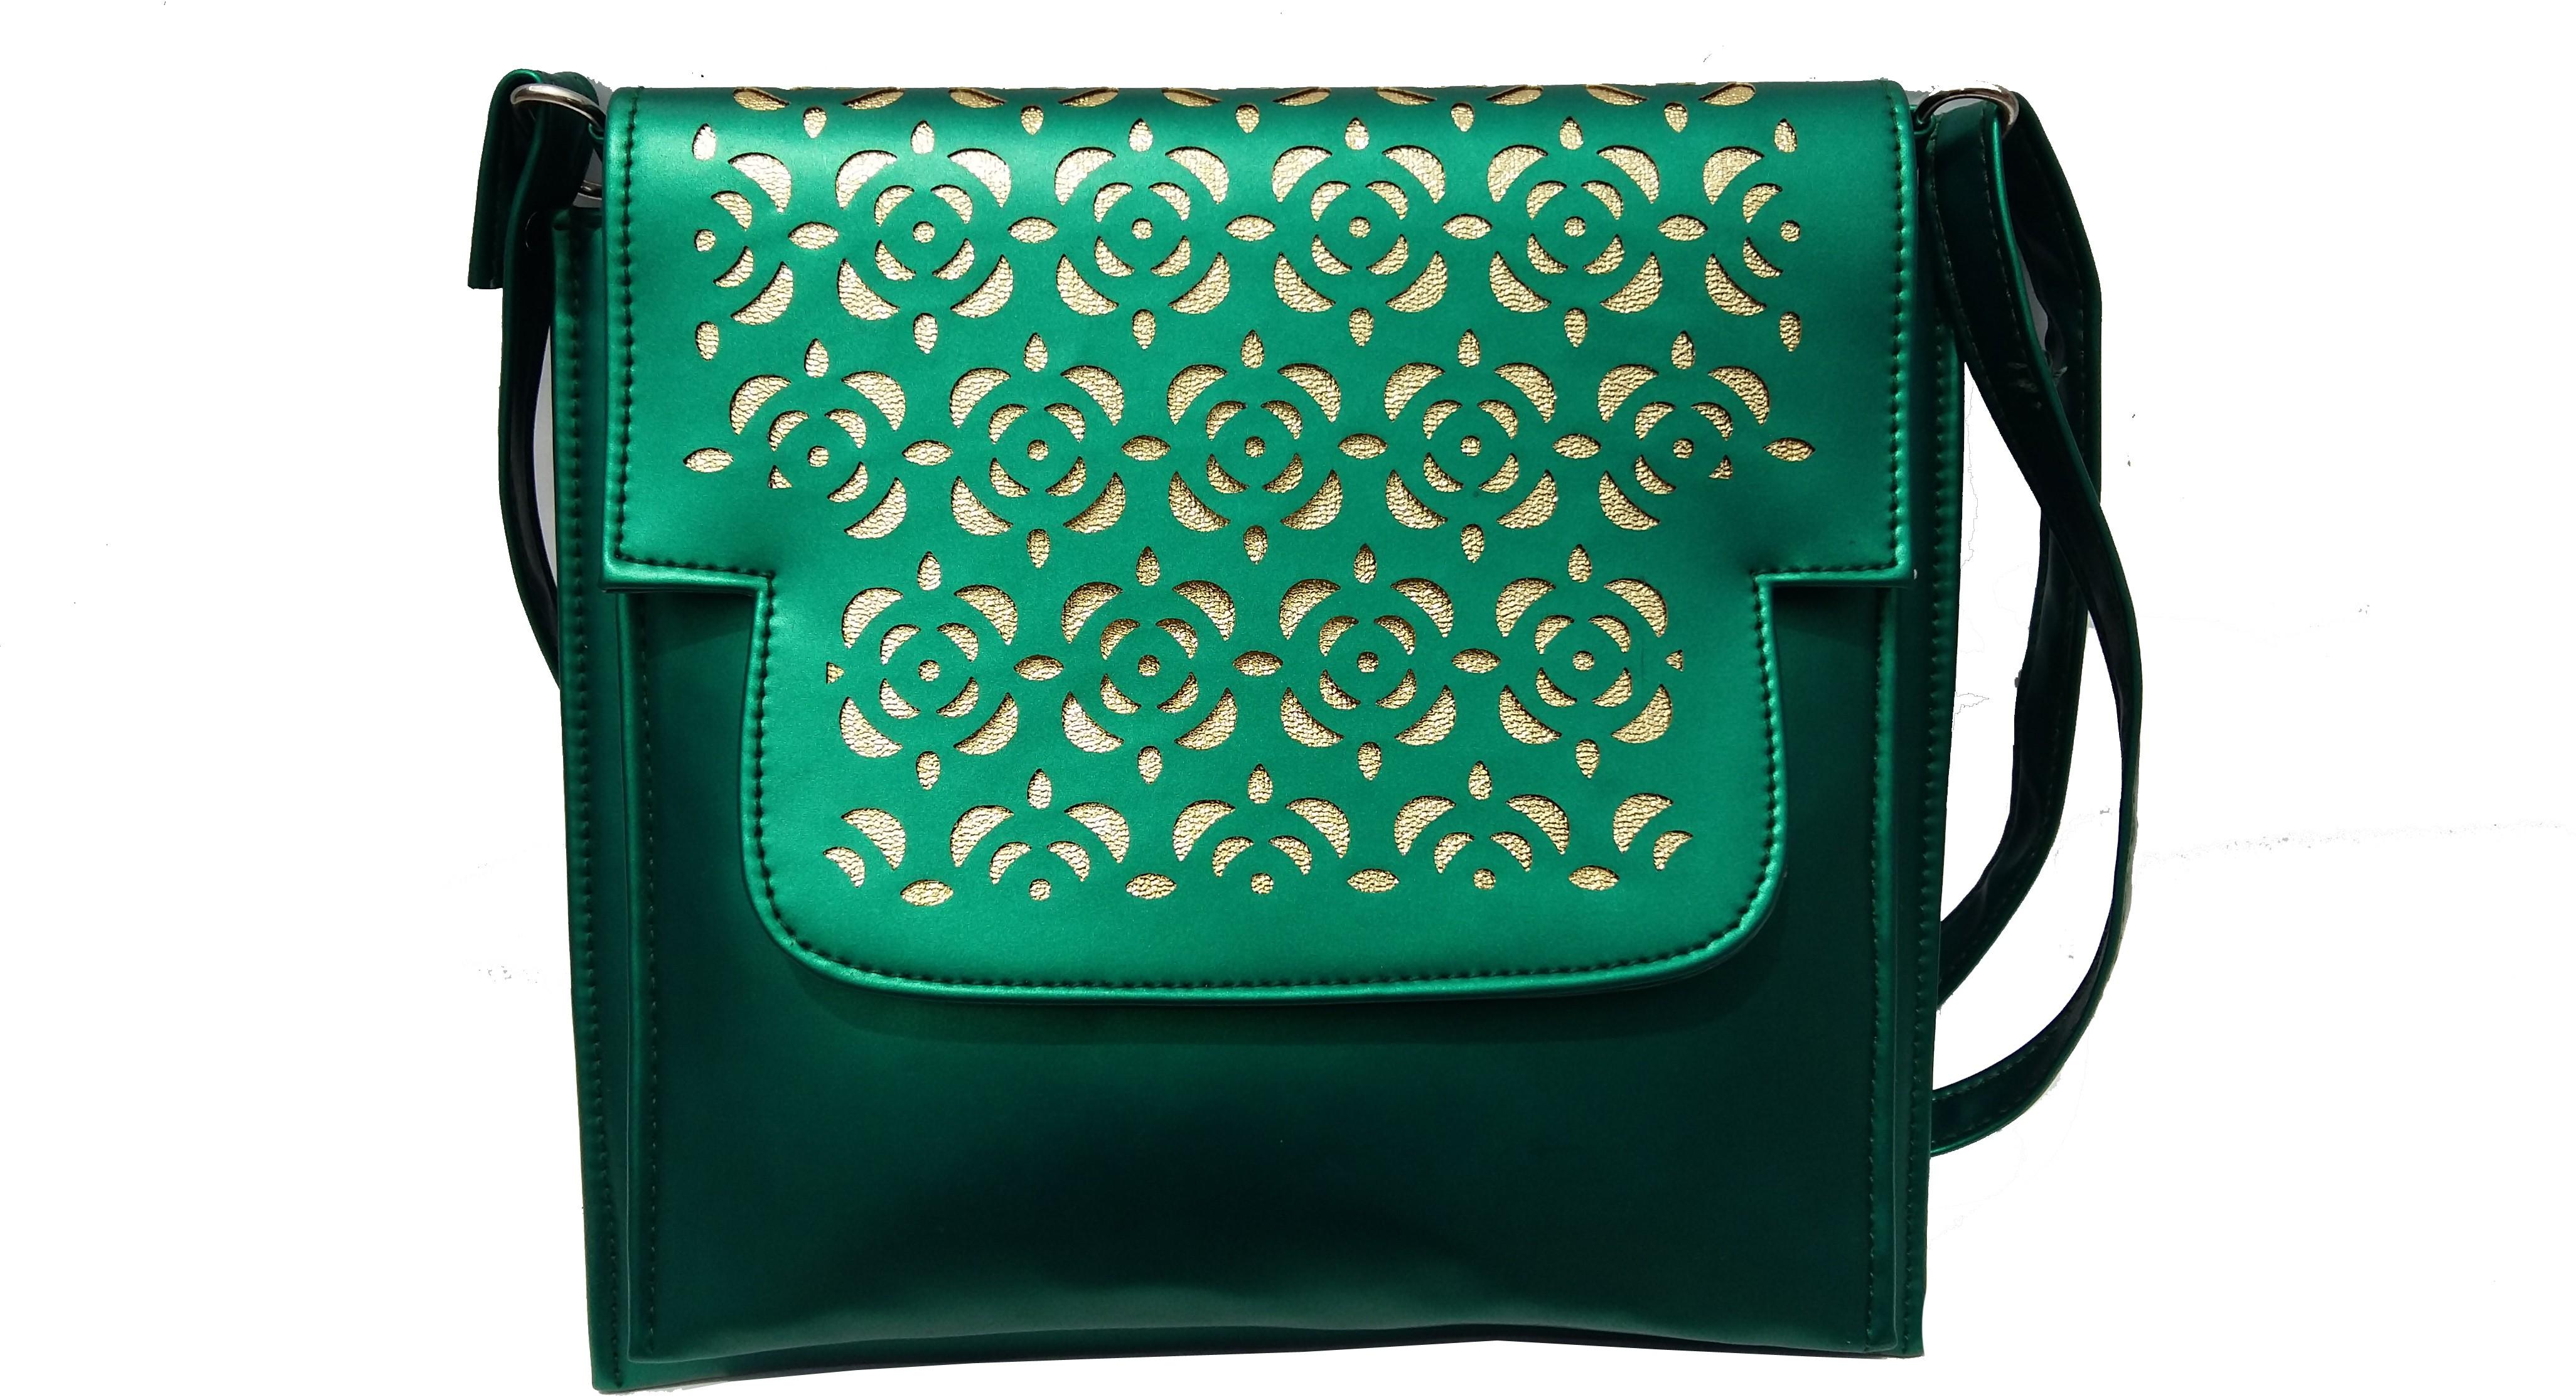 Sling bag below 500 - Surmount Girls Women Green Canvas Sling Bag